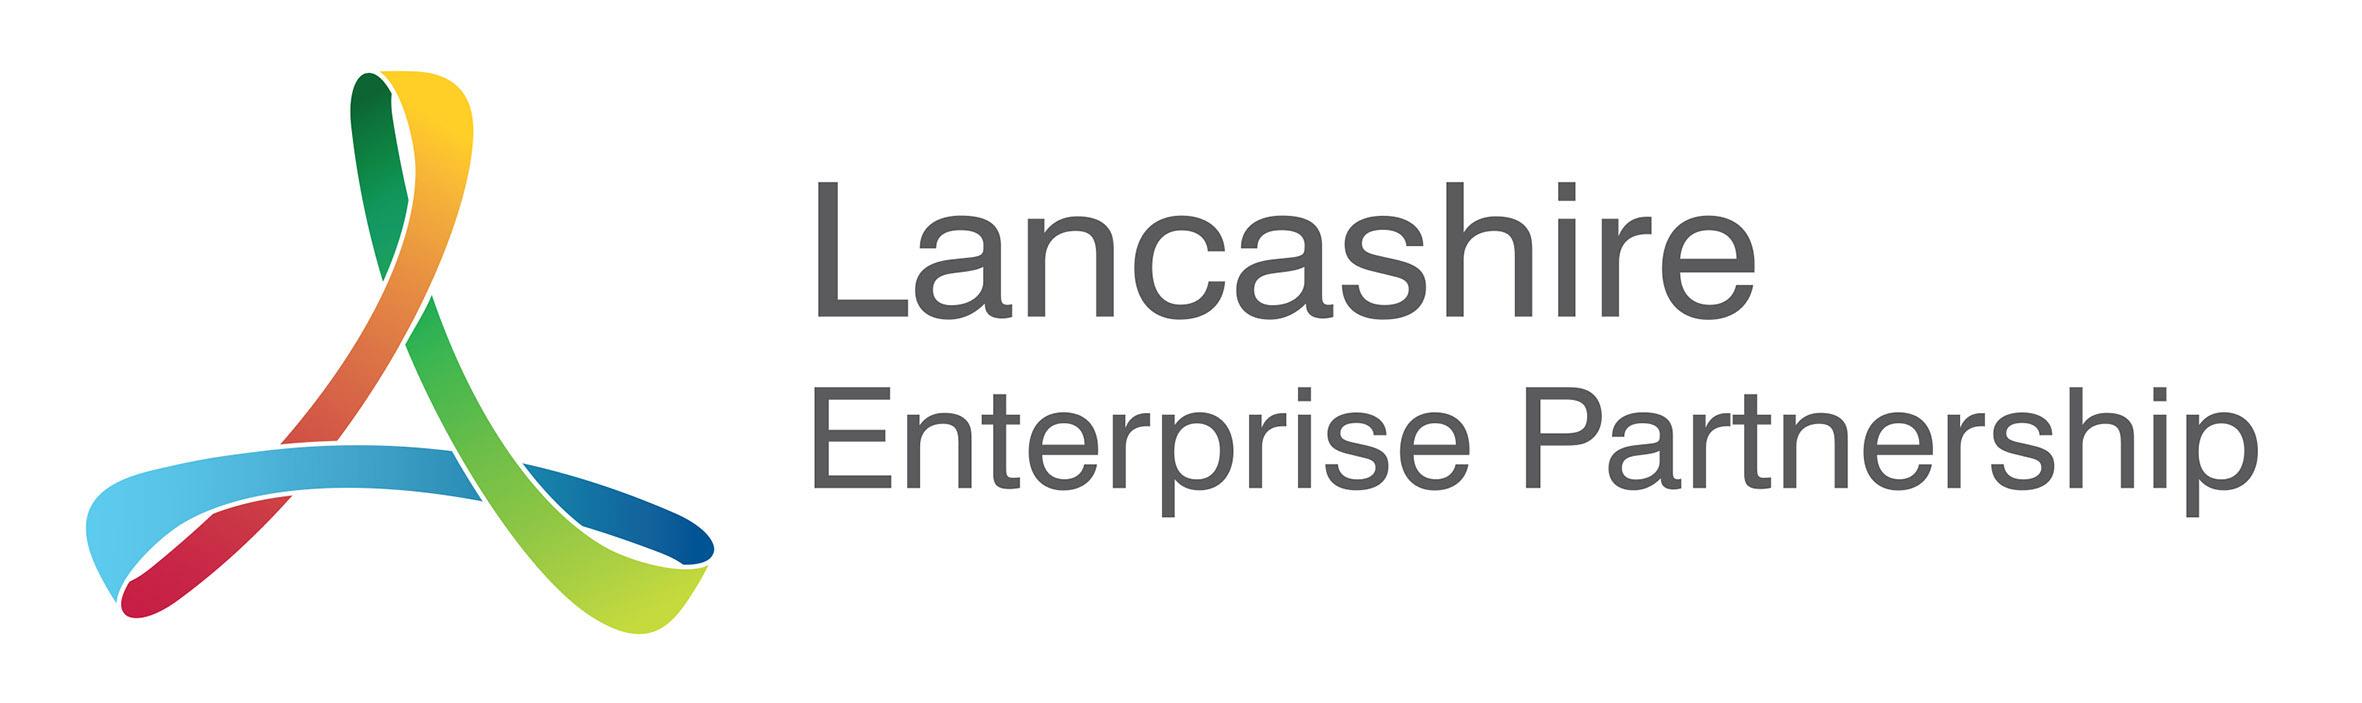 Lancashire Enterprise Partnership